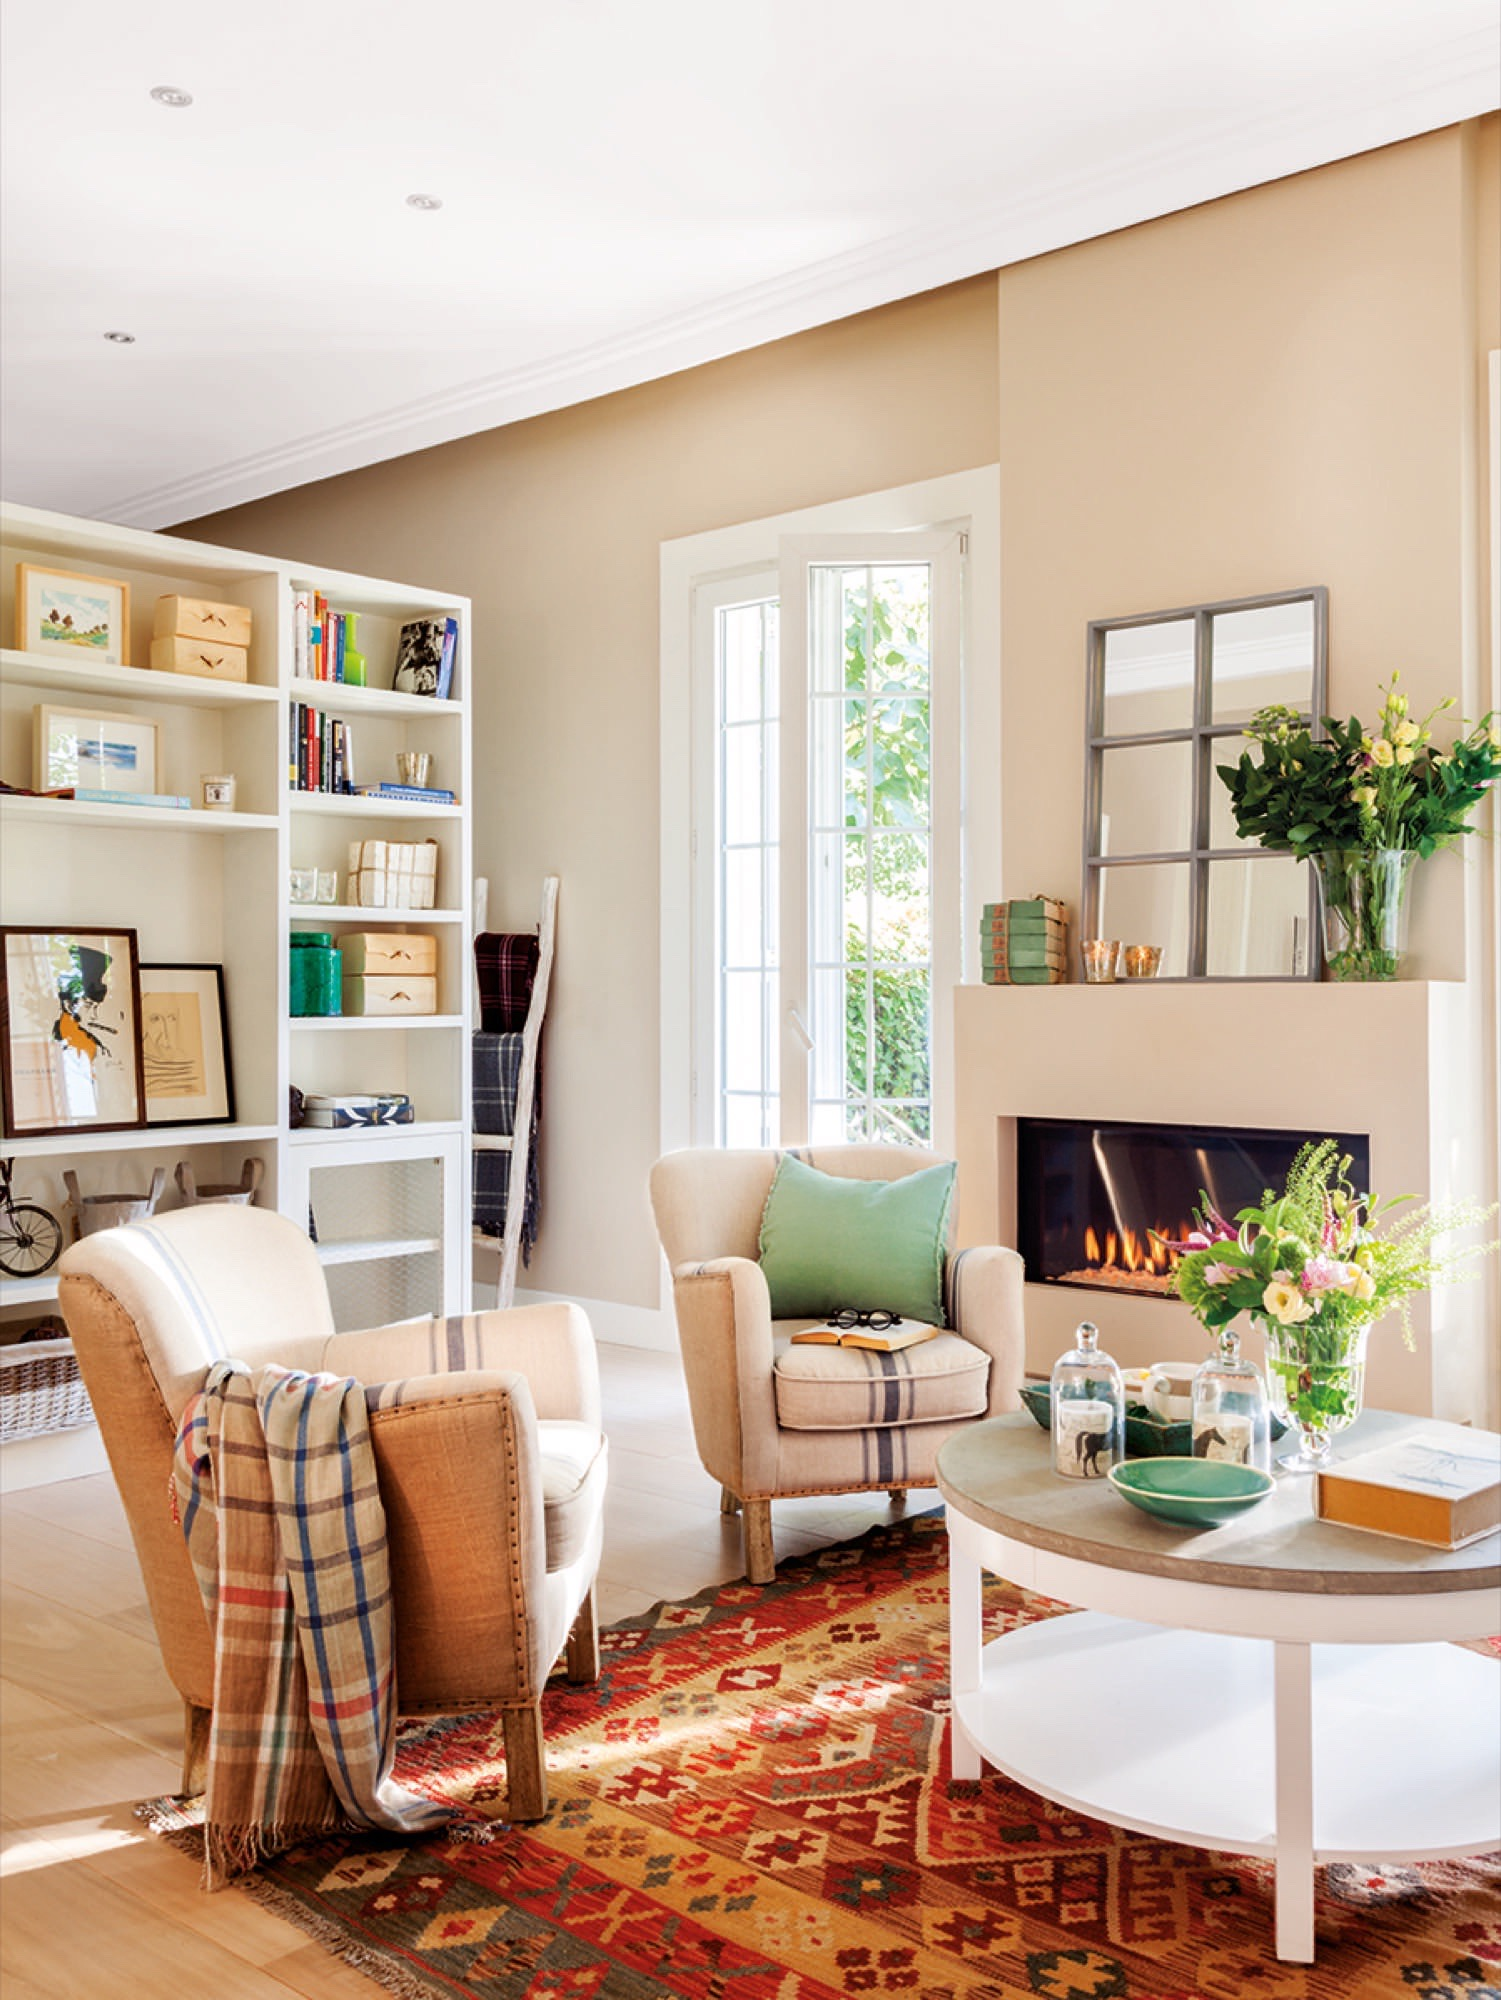 Diez pisos peque os con las mejores ideas para aprovechar - Salones pequenos ikea ...